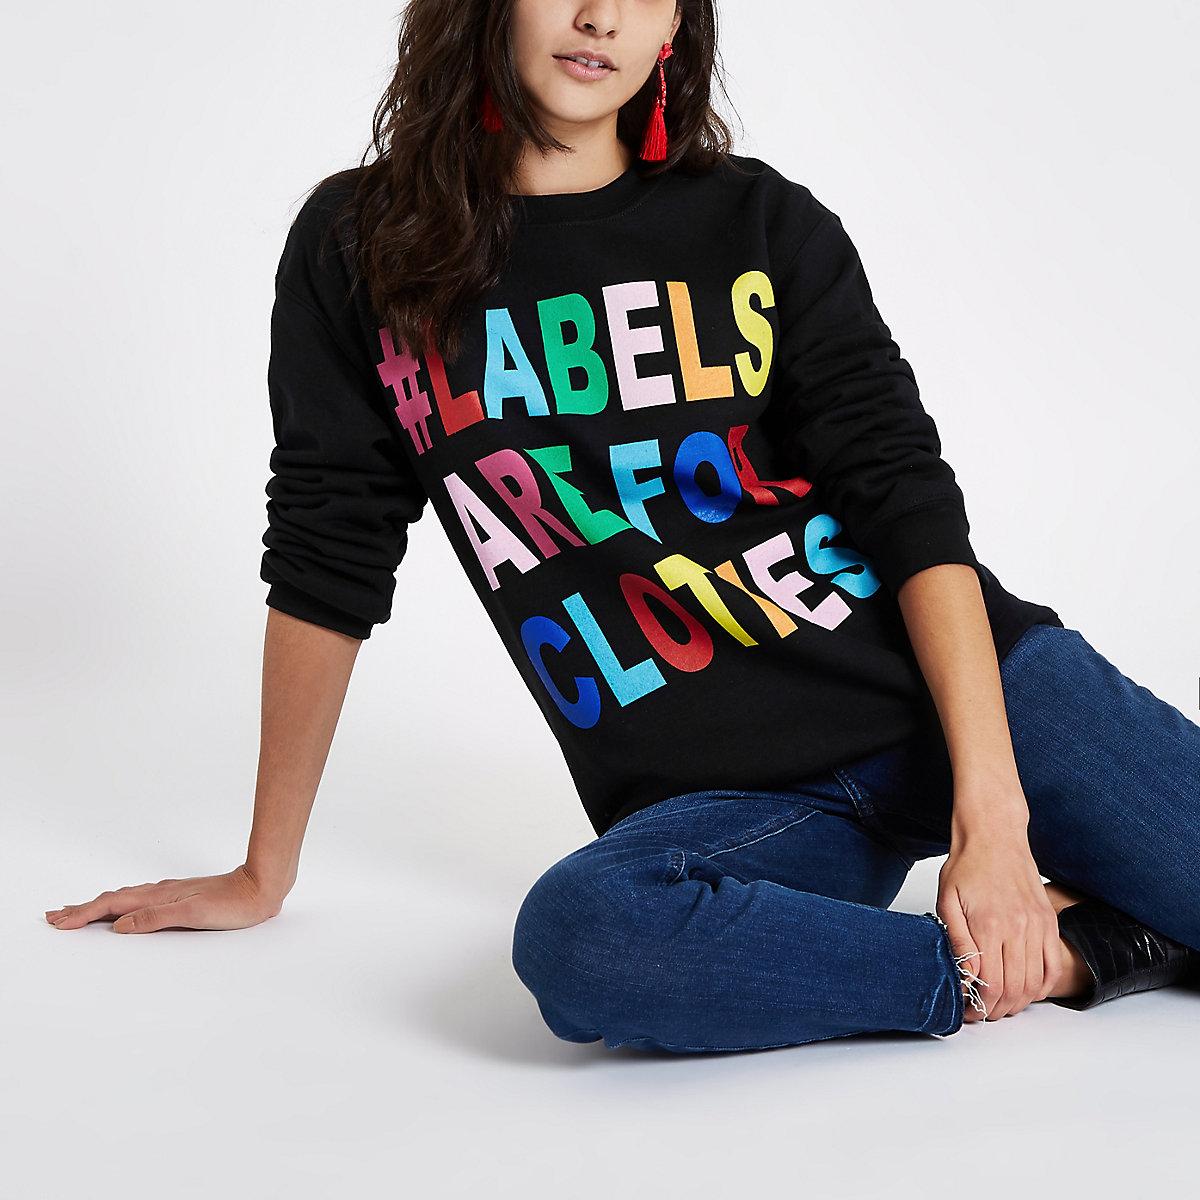 Black Ditch the Label charity sweatshirt